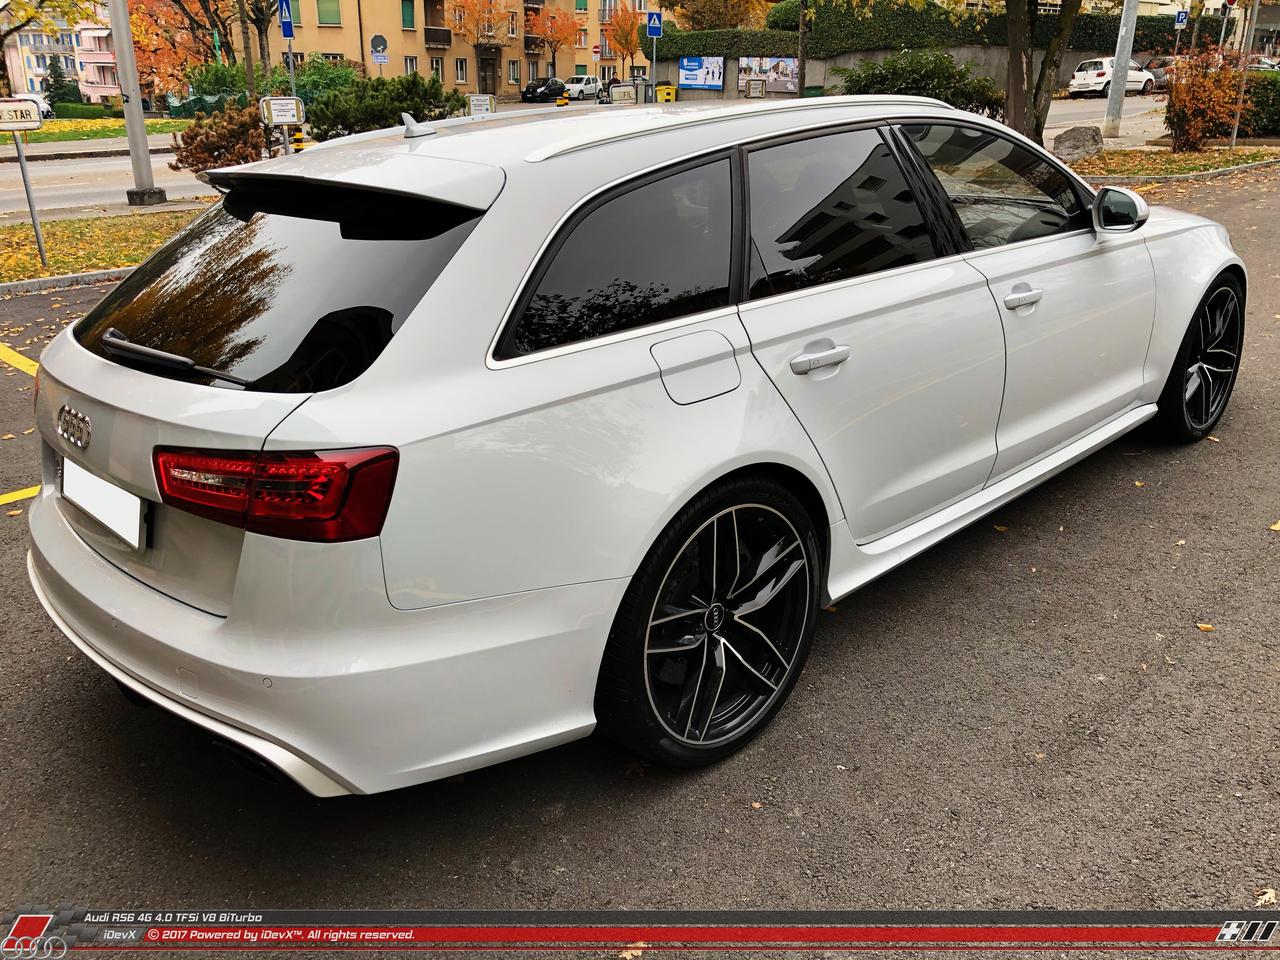 10_11.2018_Audi-RS6_iDevX_024.png